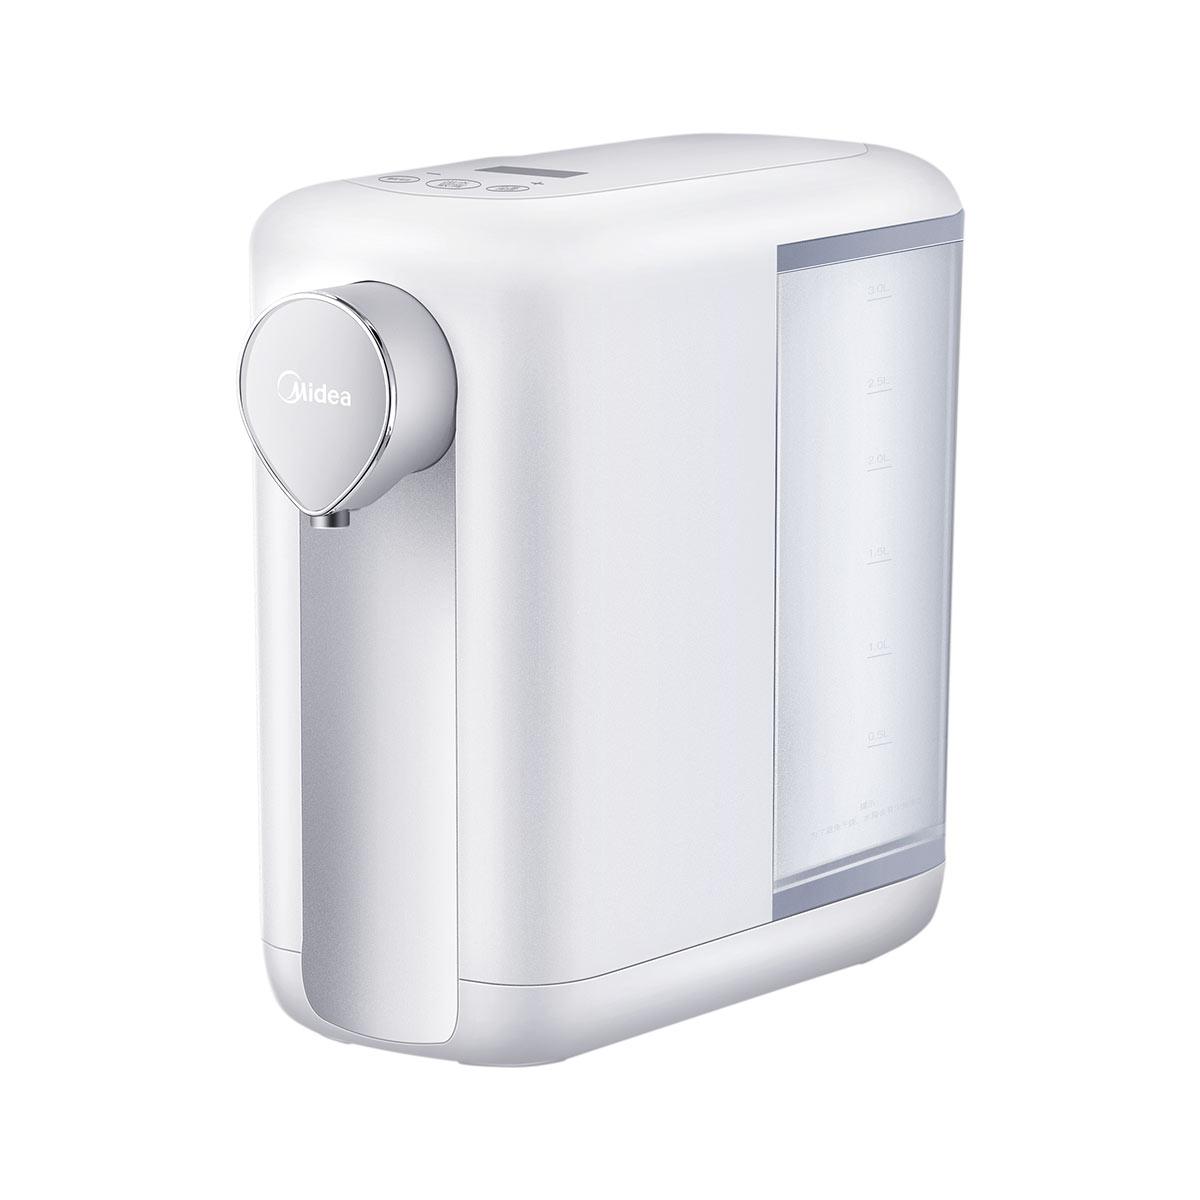 Midea/美的 MK-HE3003电热水瓶 说明书.pdf